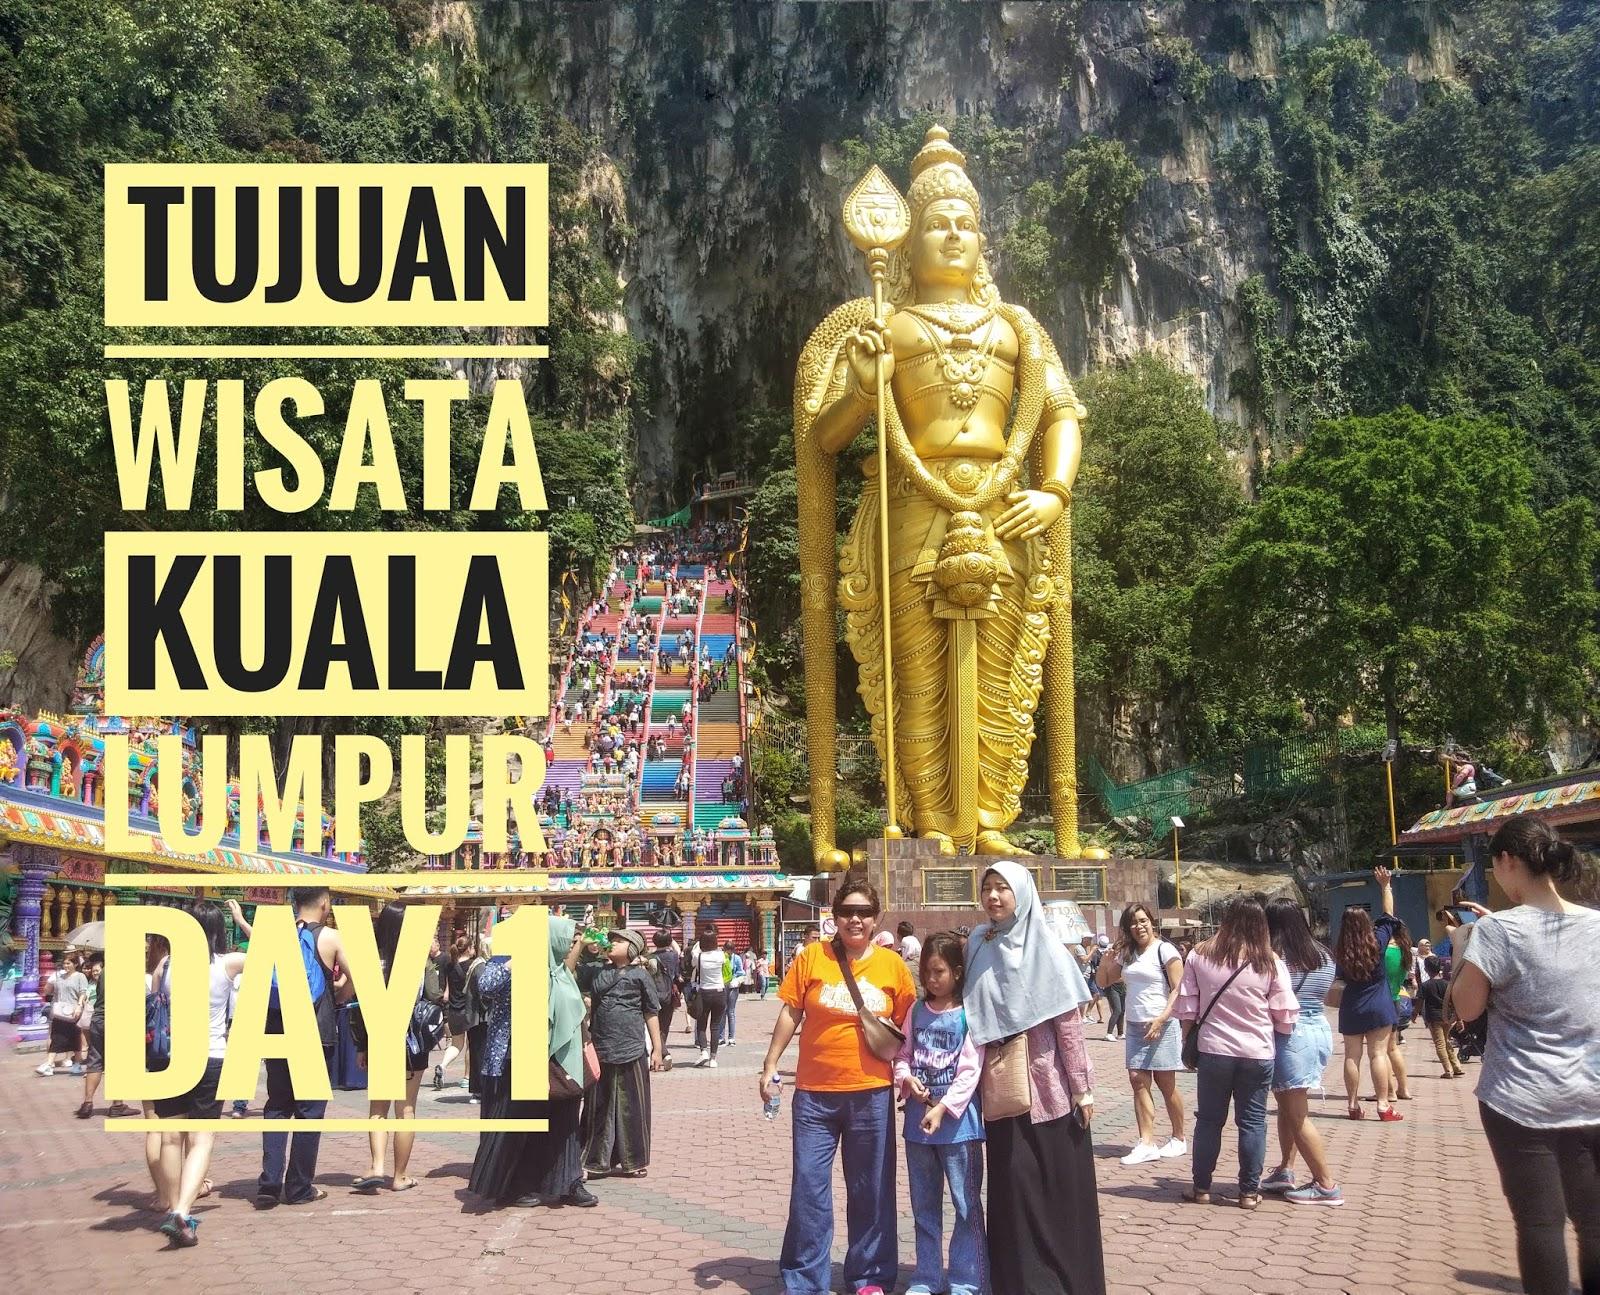 Tujuan Wisata Kuala Lumpur Day 1 Terjebak Macet Di Bukit